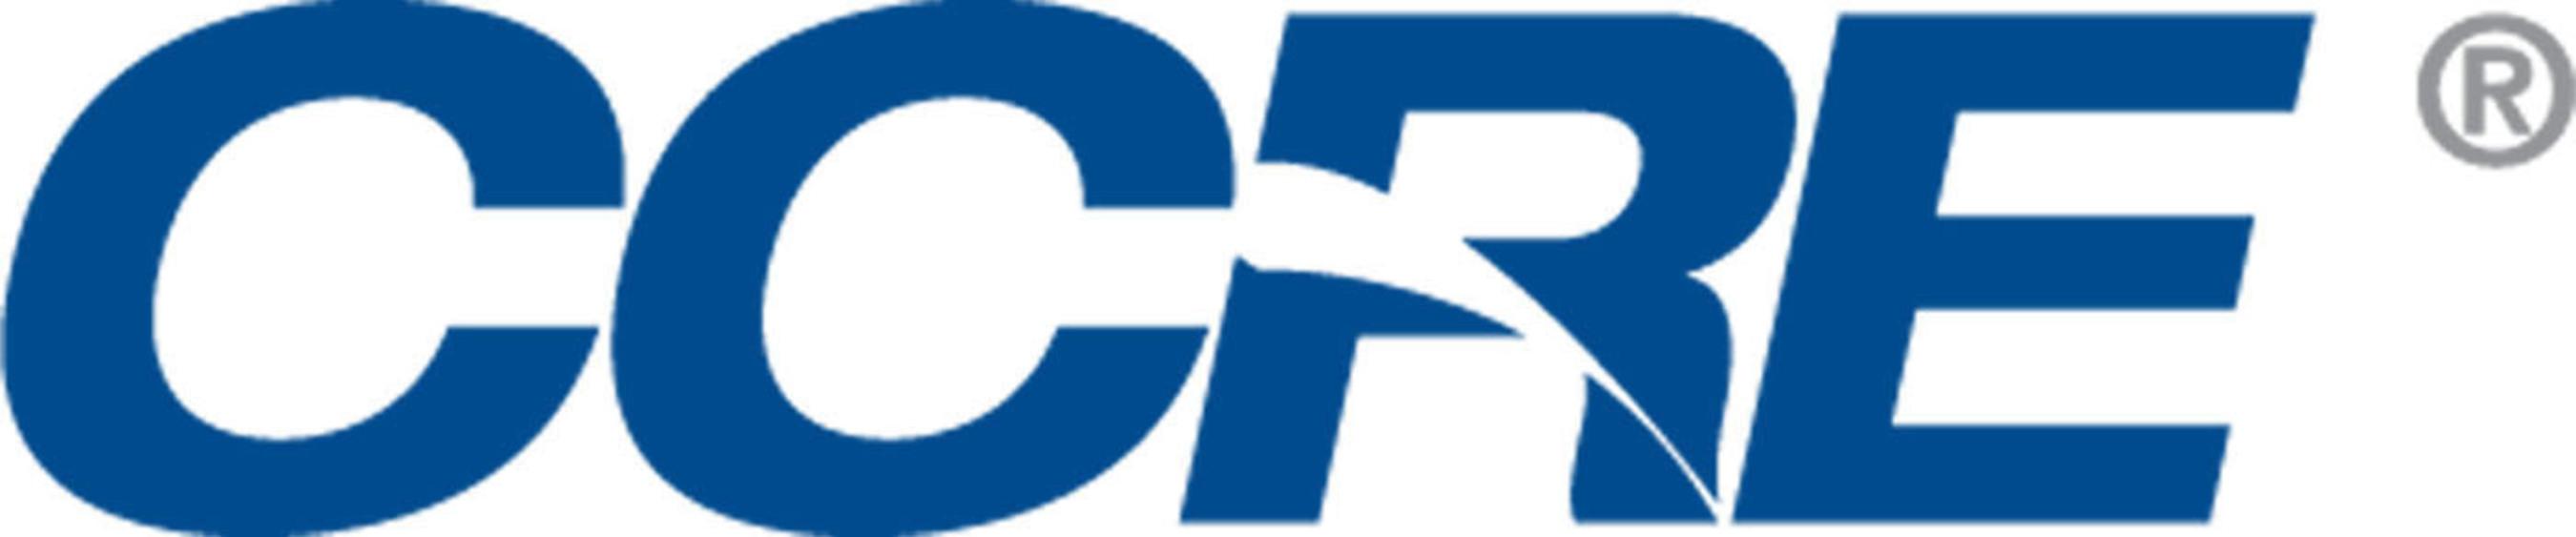 Cantor Commercial Real Estate Logo.